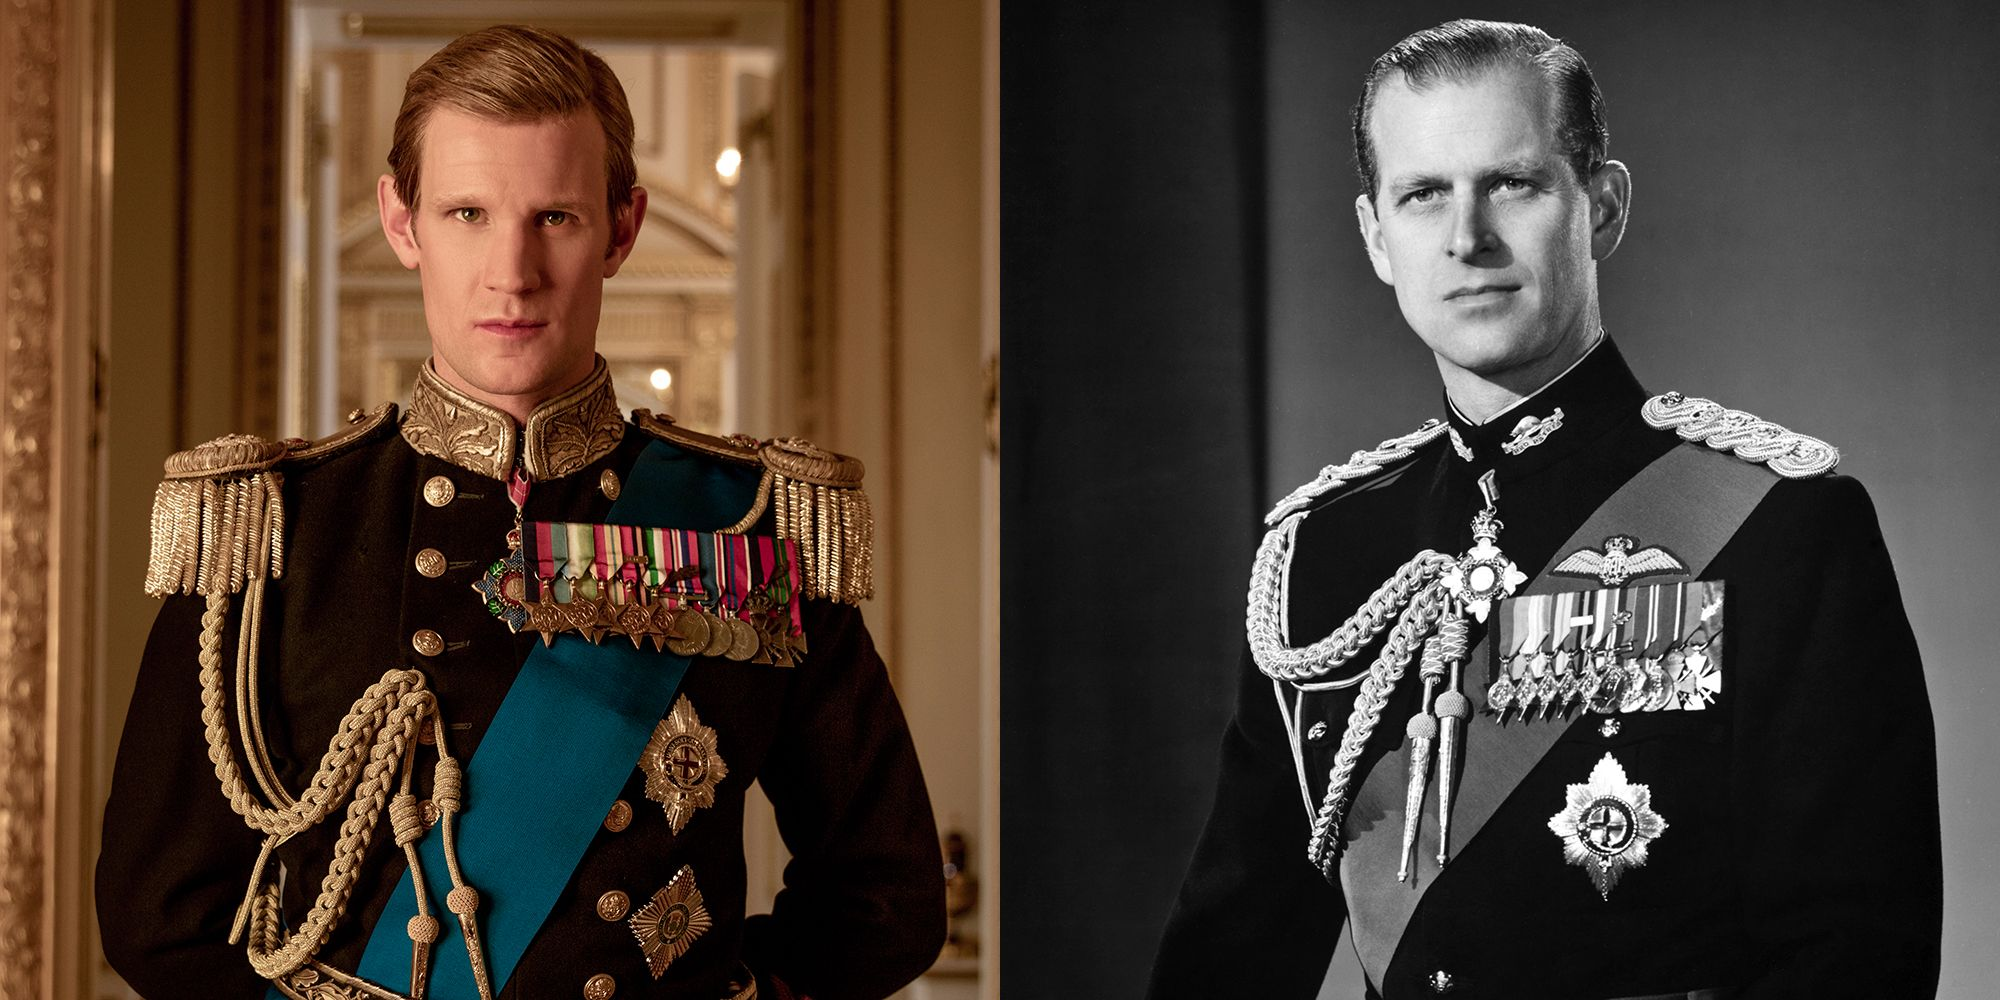 Prince Philip, the Duke of Edinburgh (seasons 1 and 2)